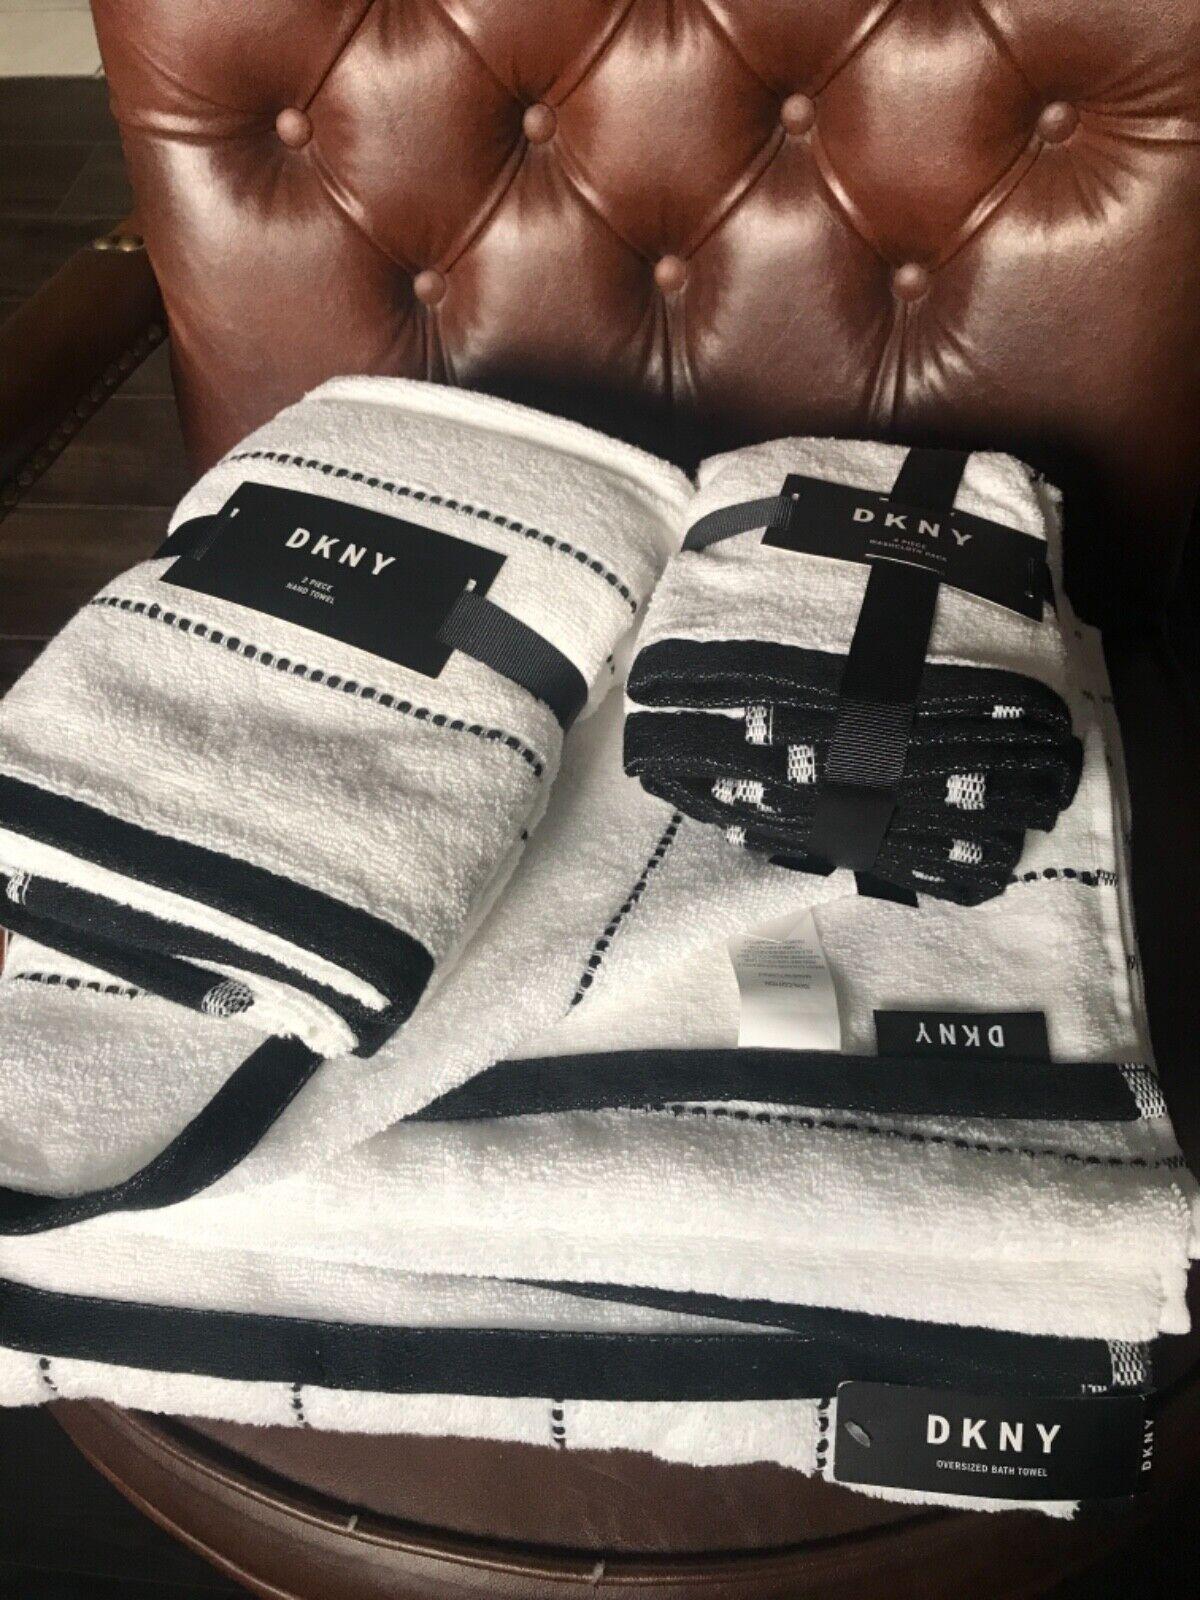 (8) DKNY Bathroom Black White Stripe Bath Towels Hand Towels Wash Cloths ~NEW ~